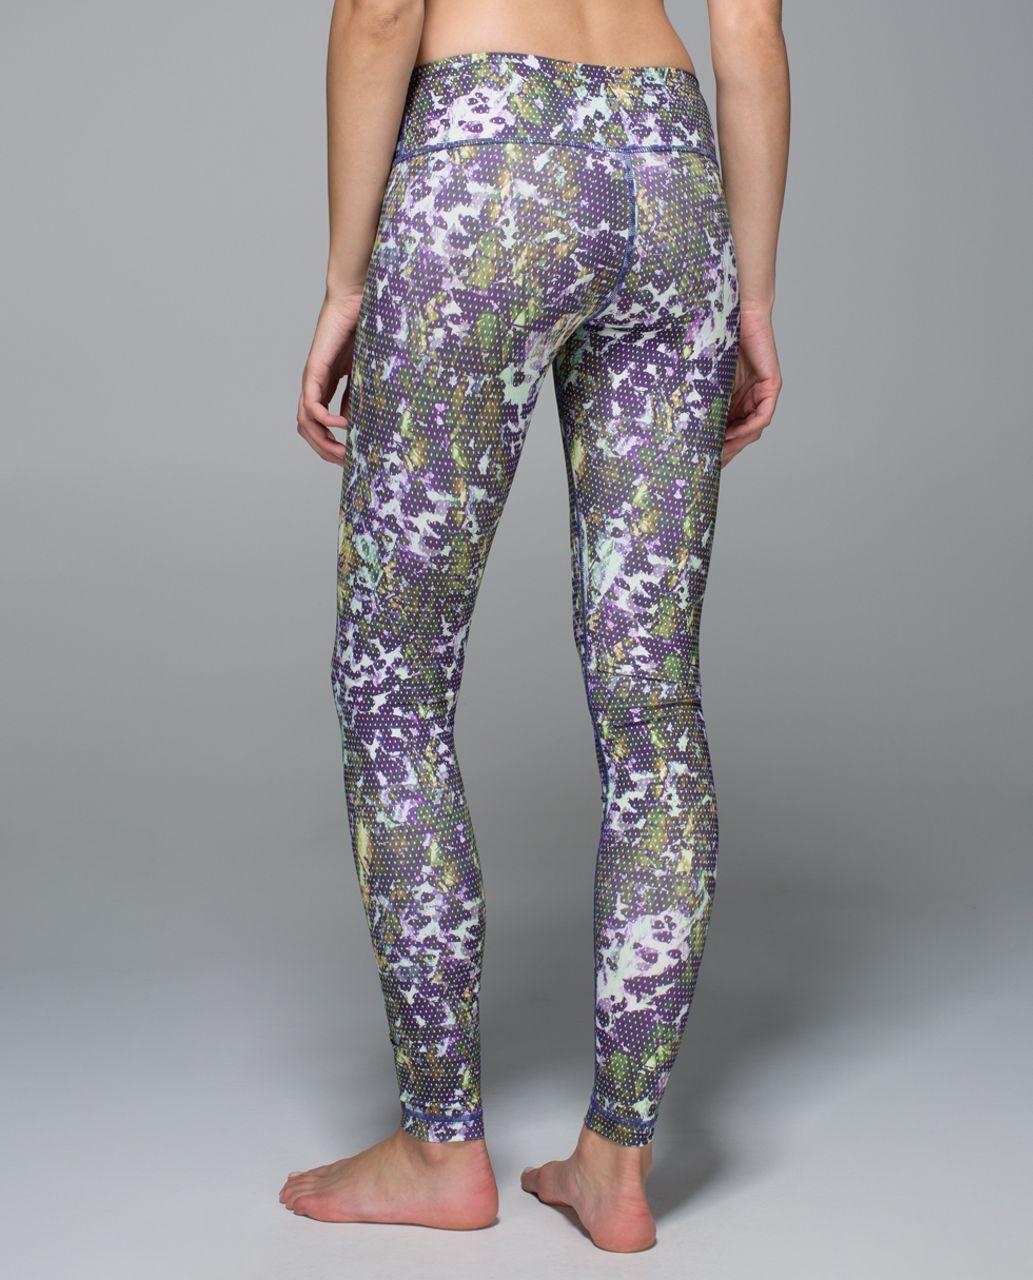 Lululemon Wunder Under Pant *Full-On Luxtreme - Floral Sport Backdrop Iris Flower Multi